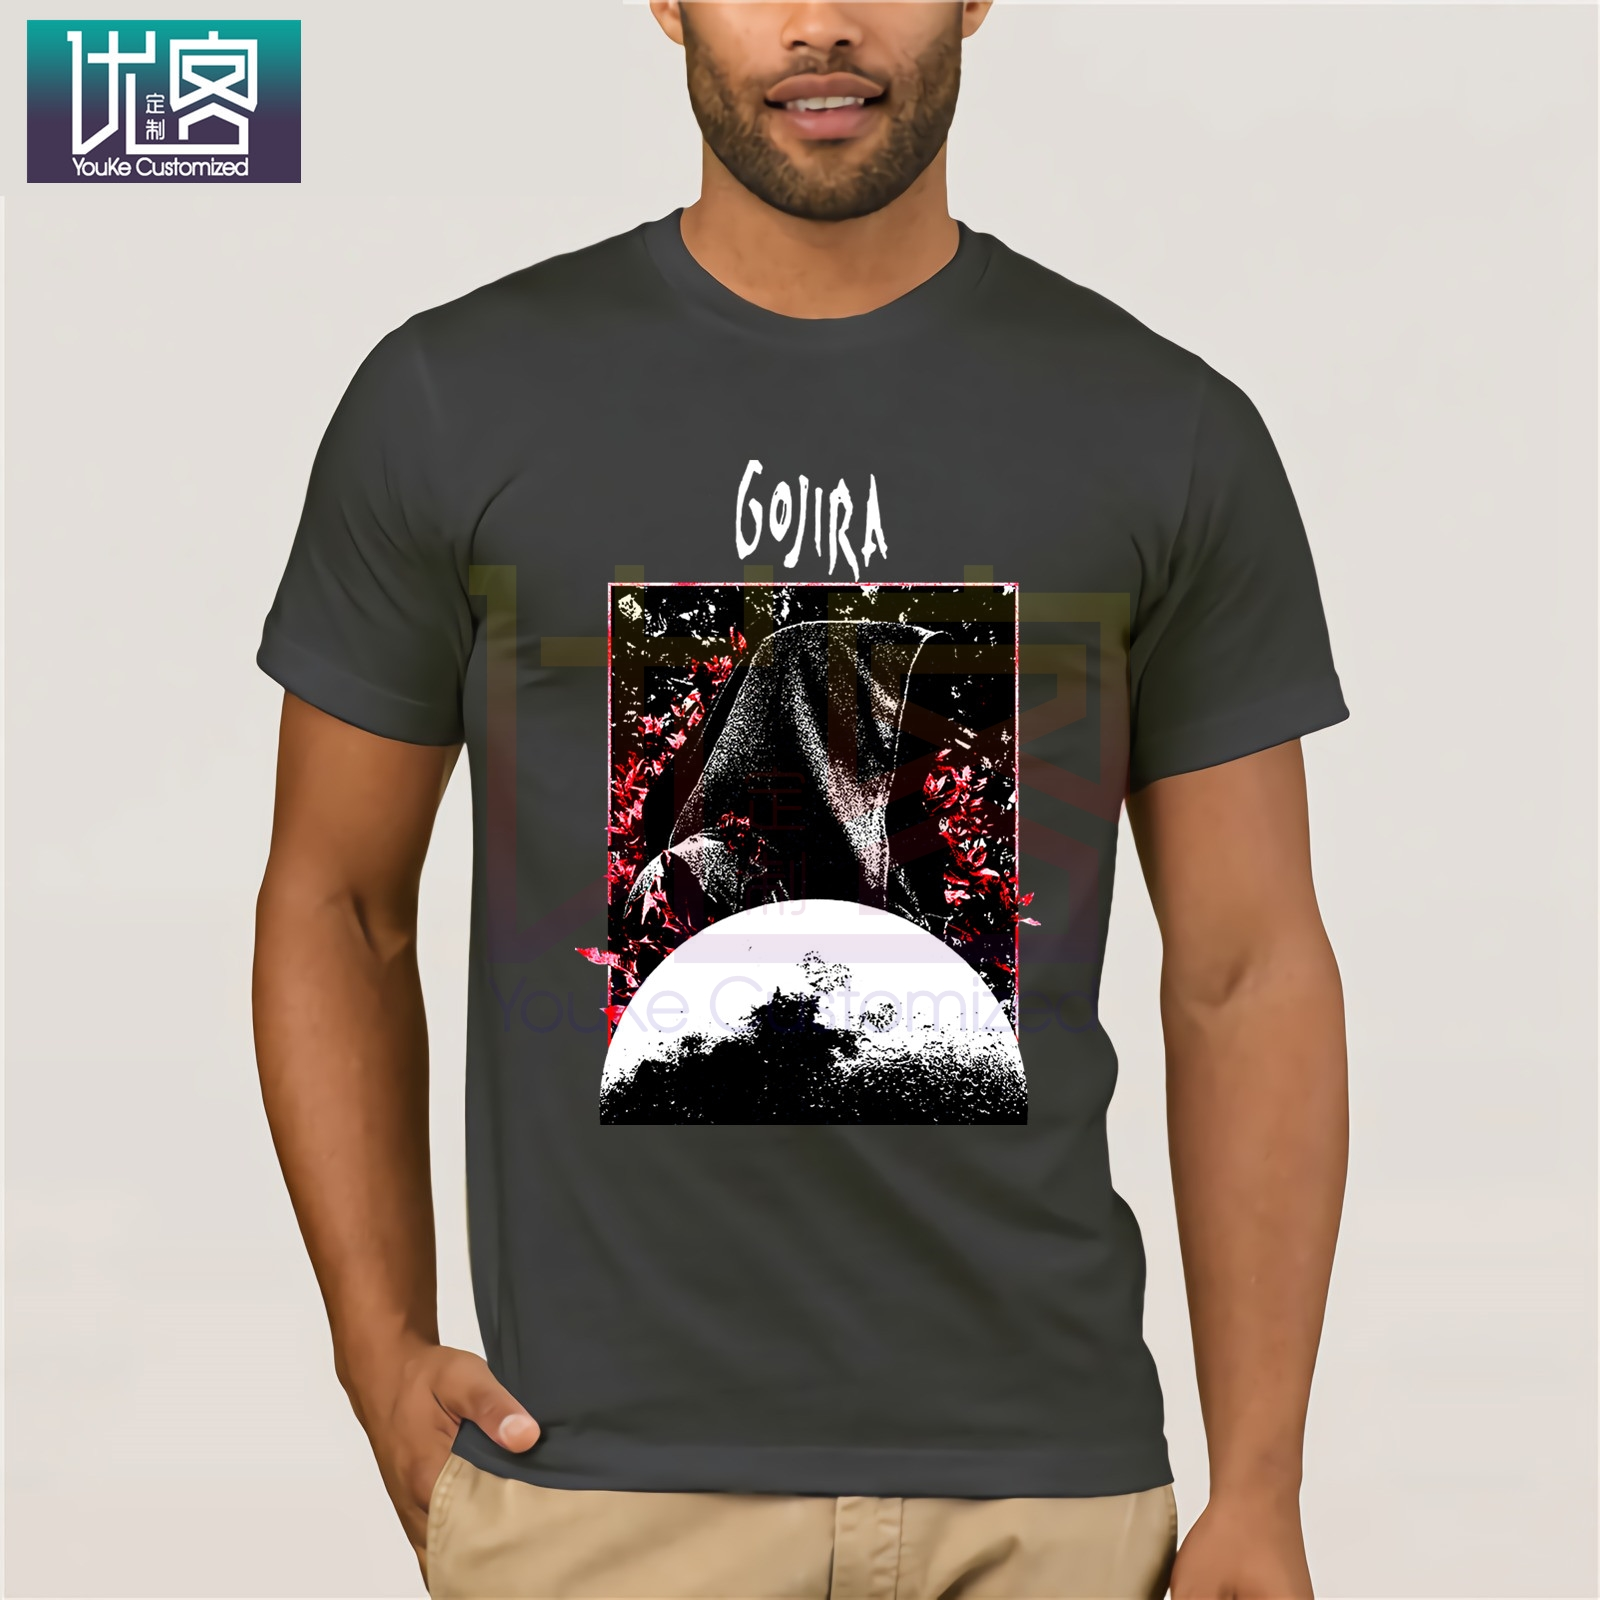 T-Shirt Grim Moon \m//-\m// Gojira